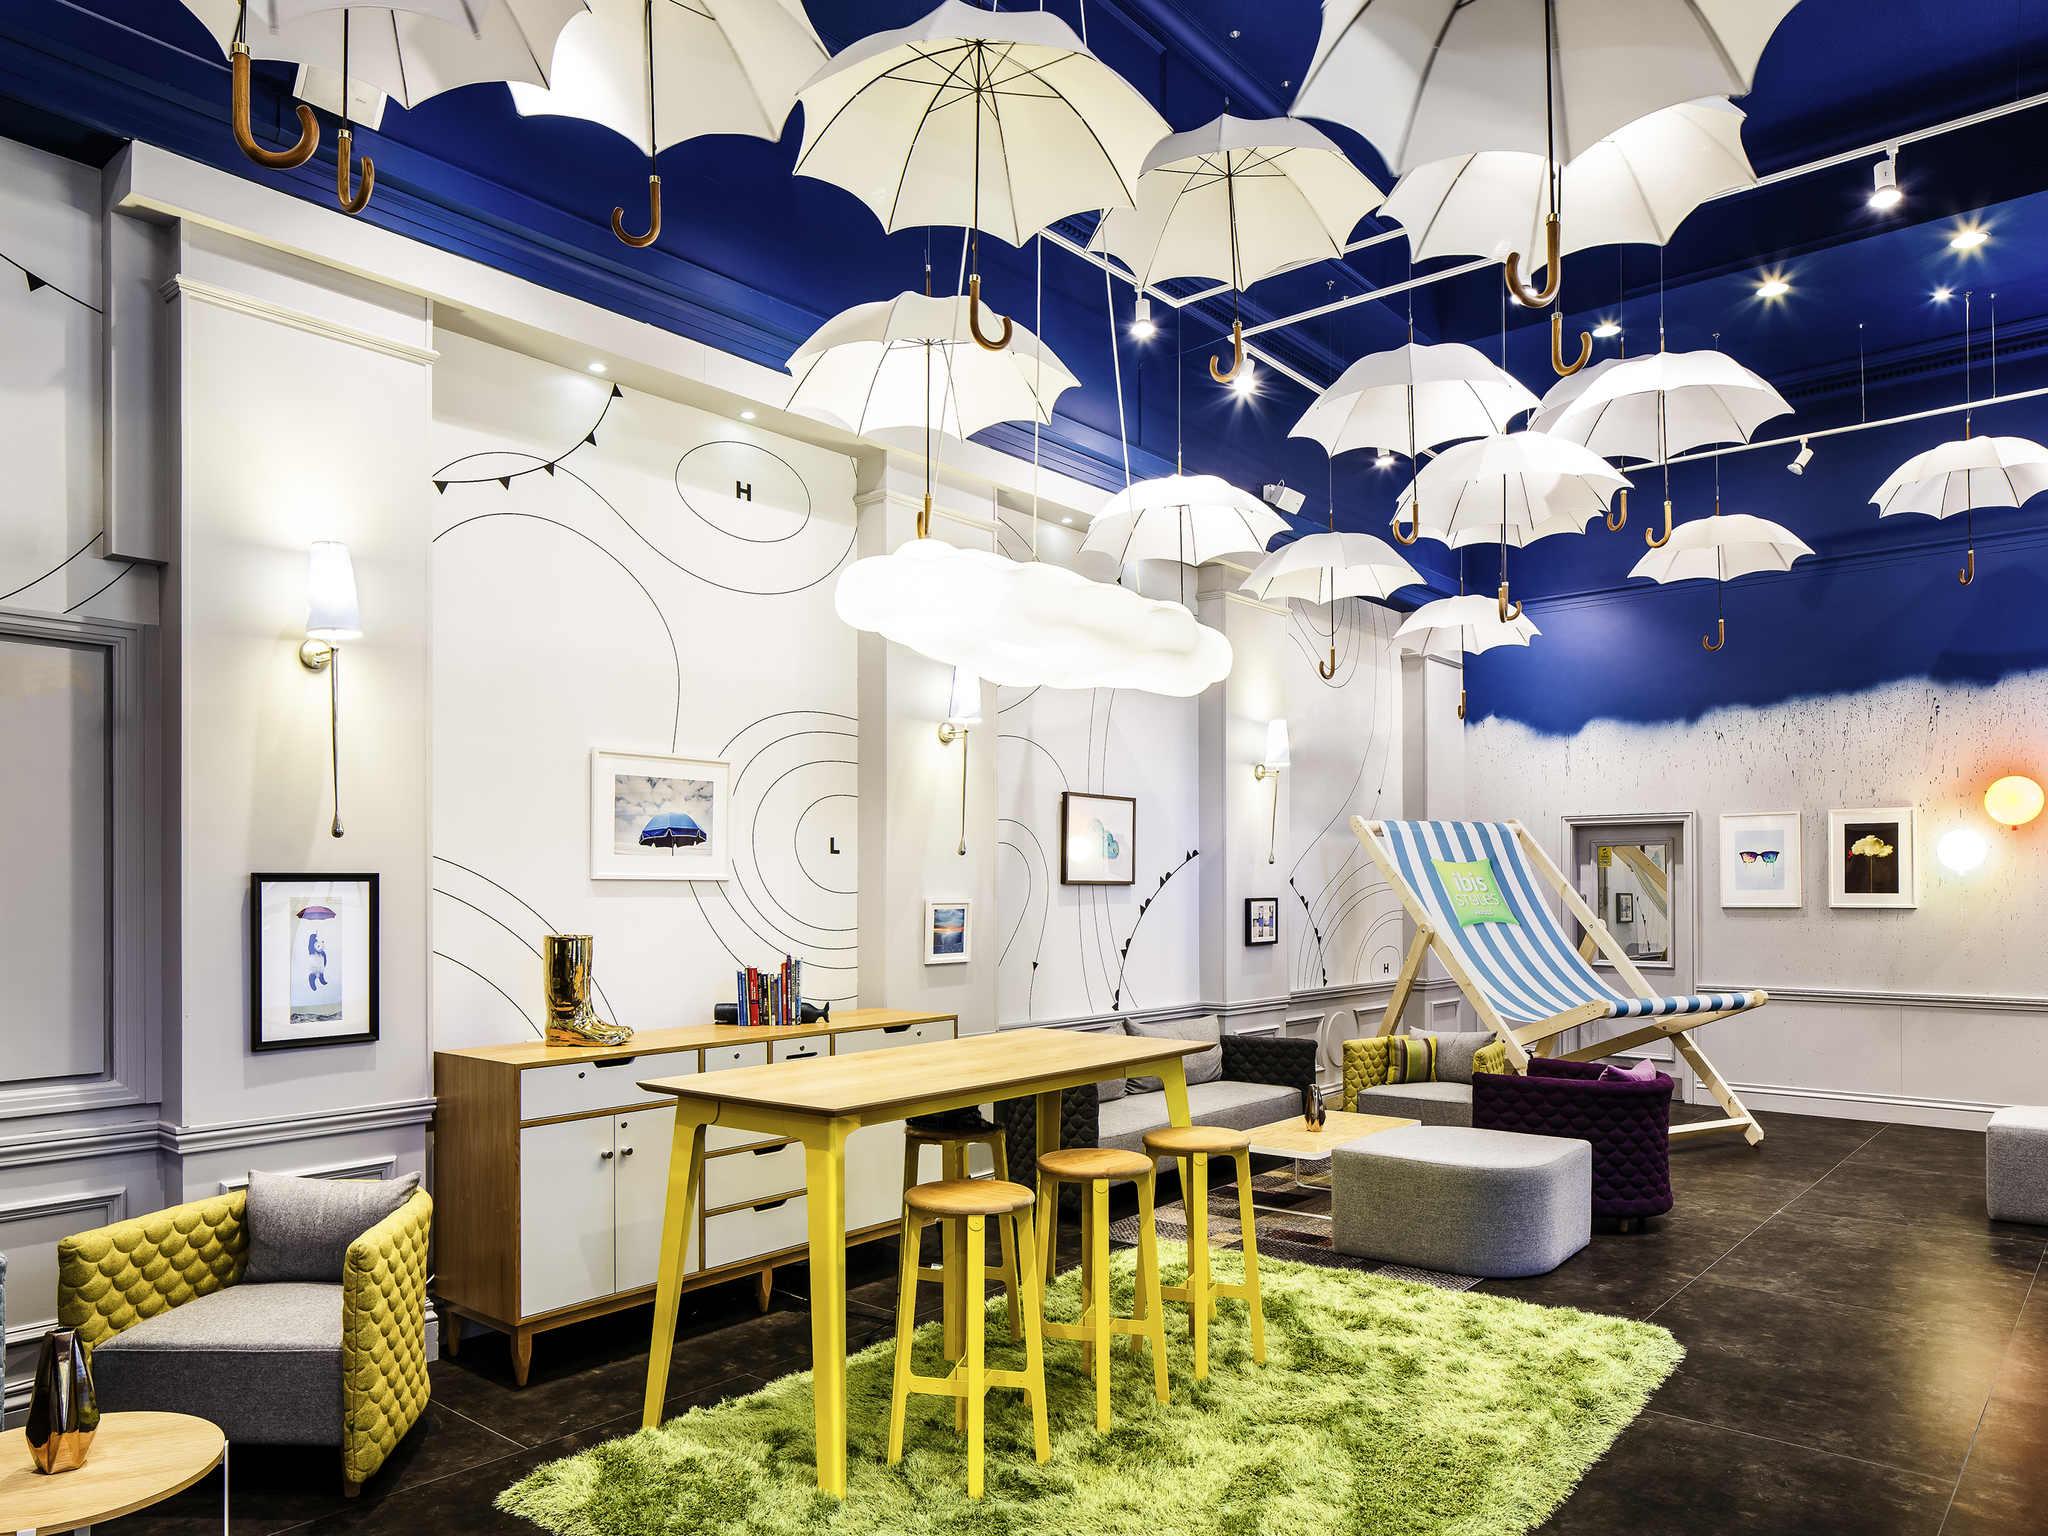 Hotel – Hotel ibis Styles Manchester Portland (recentemente remodelado)